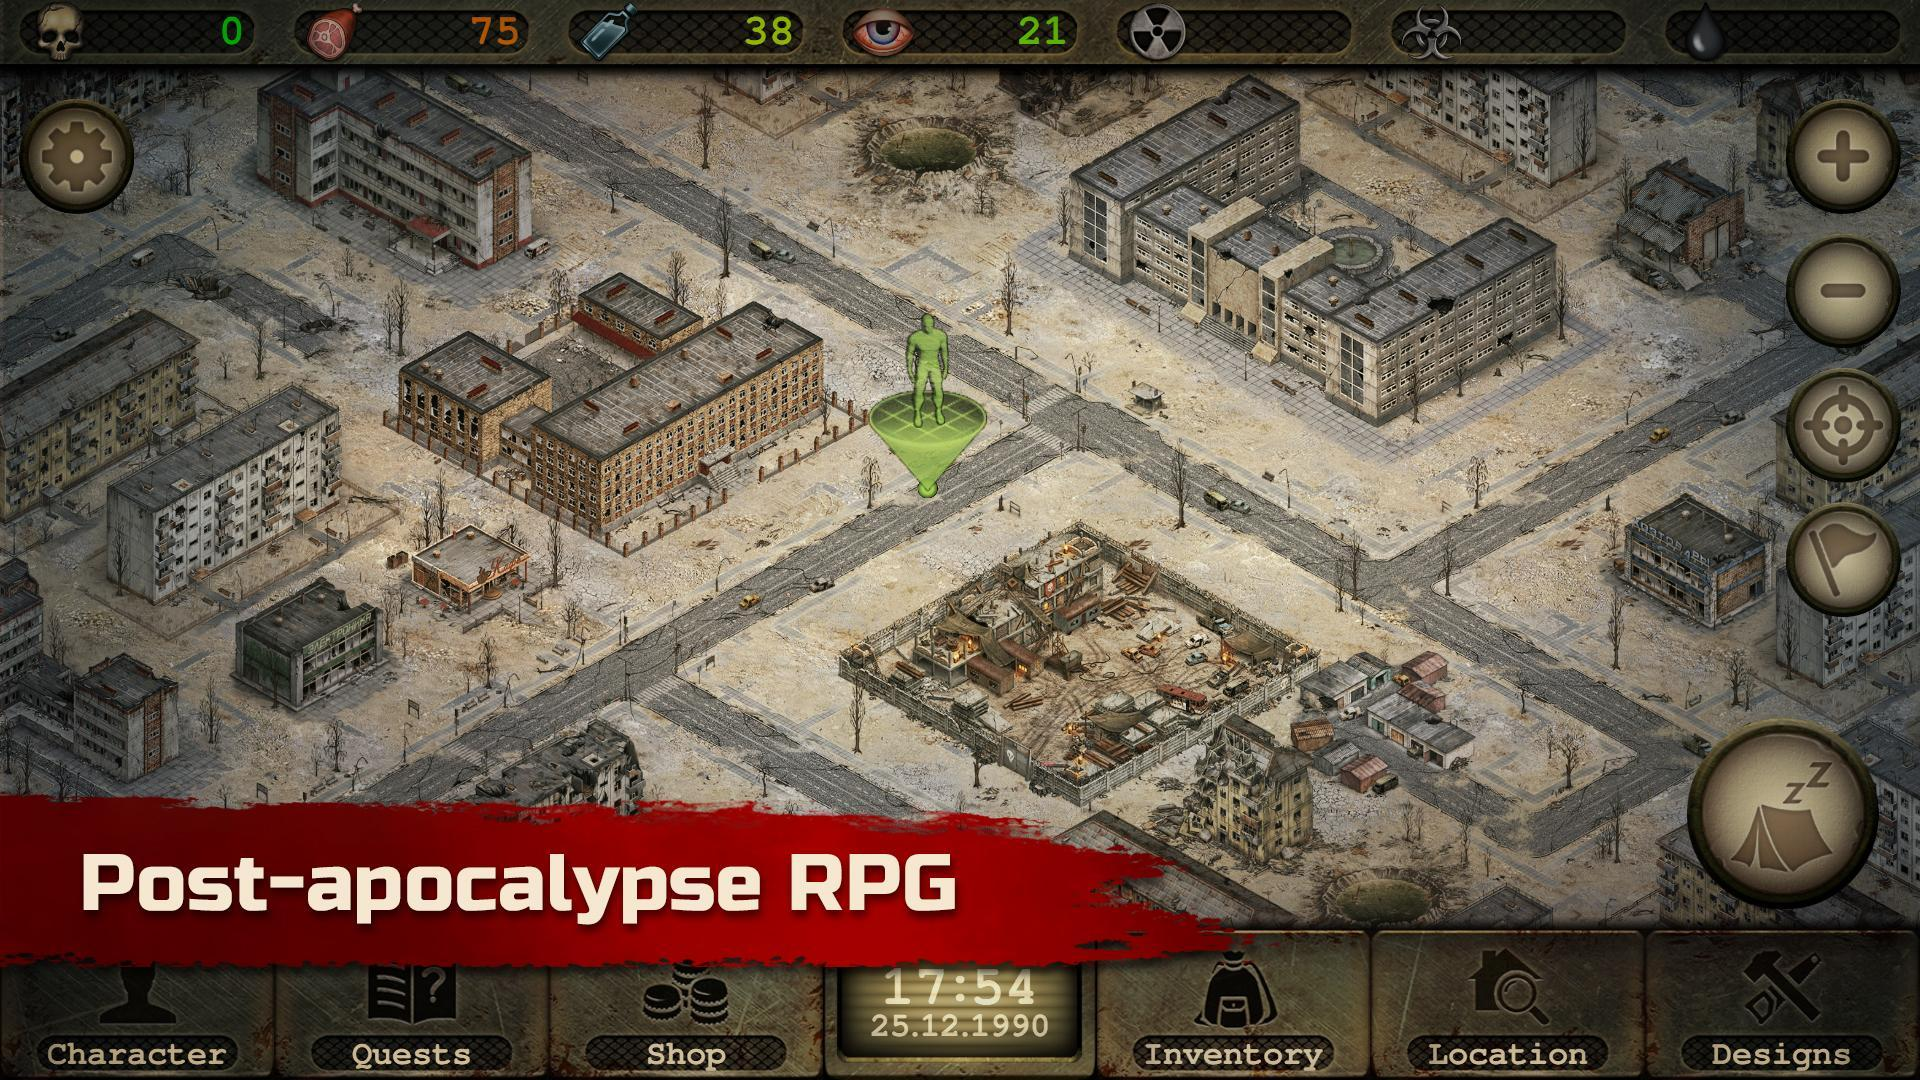 Day R Survival – Apocalypse, Lone Survivor and RPG 1.647 Screenshot 7